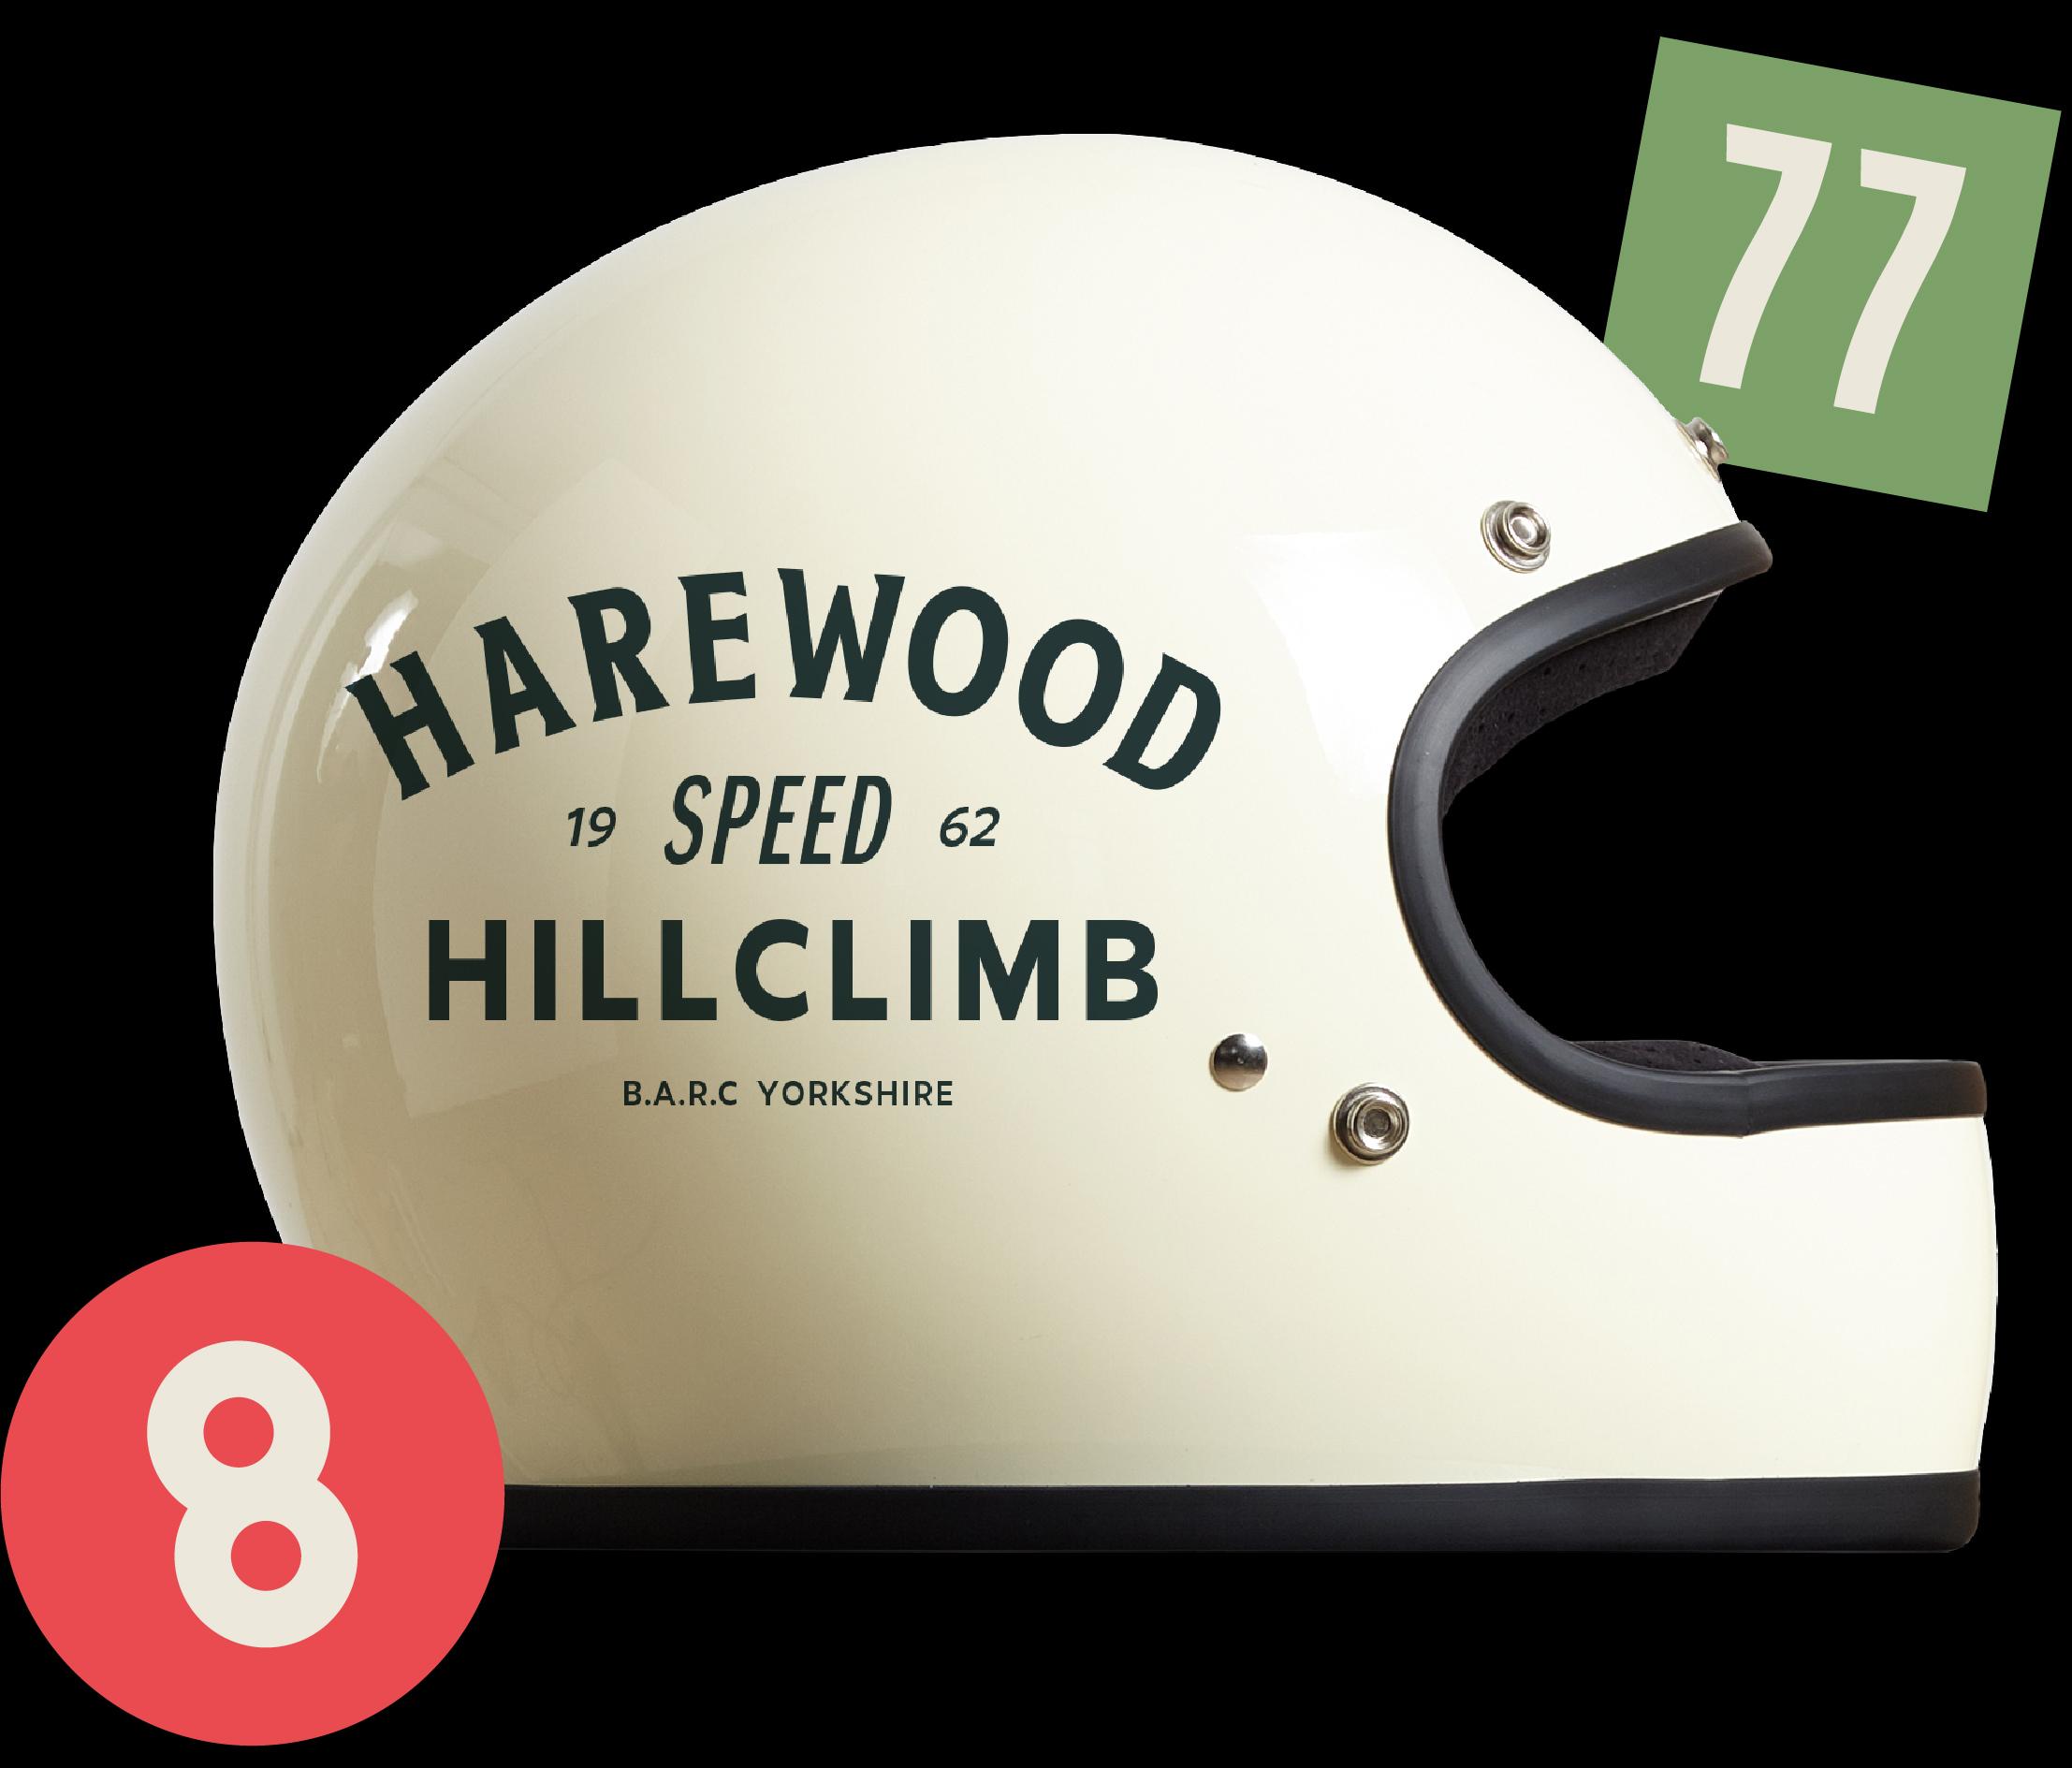 harewood hillclimb helmet and stickers